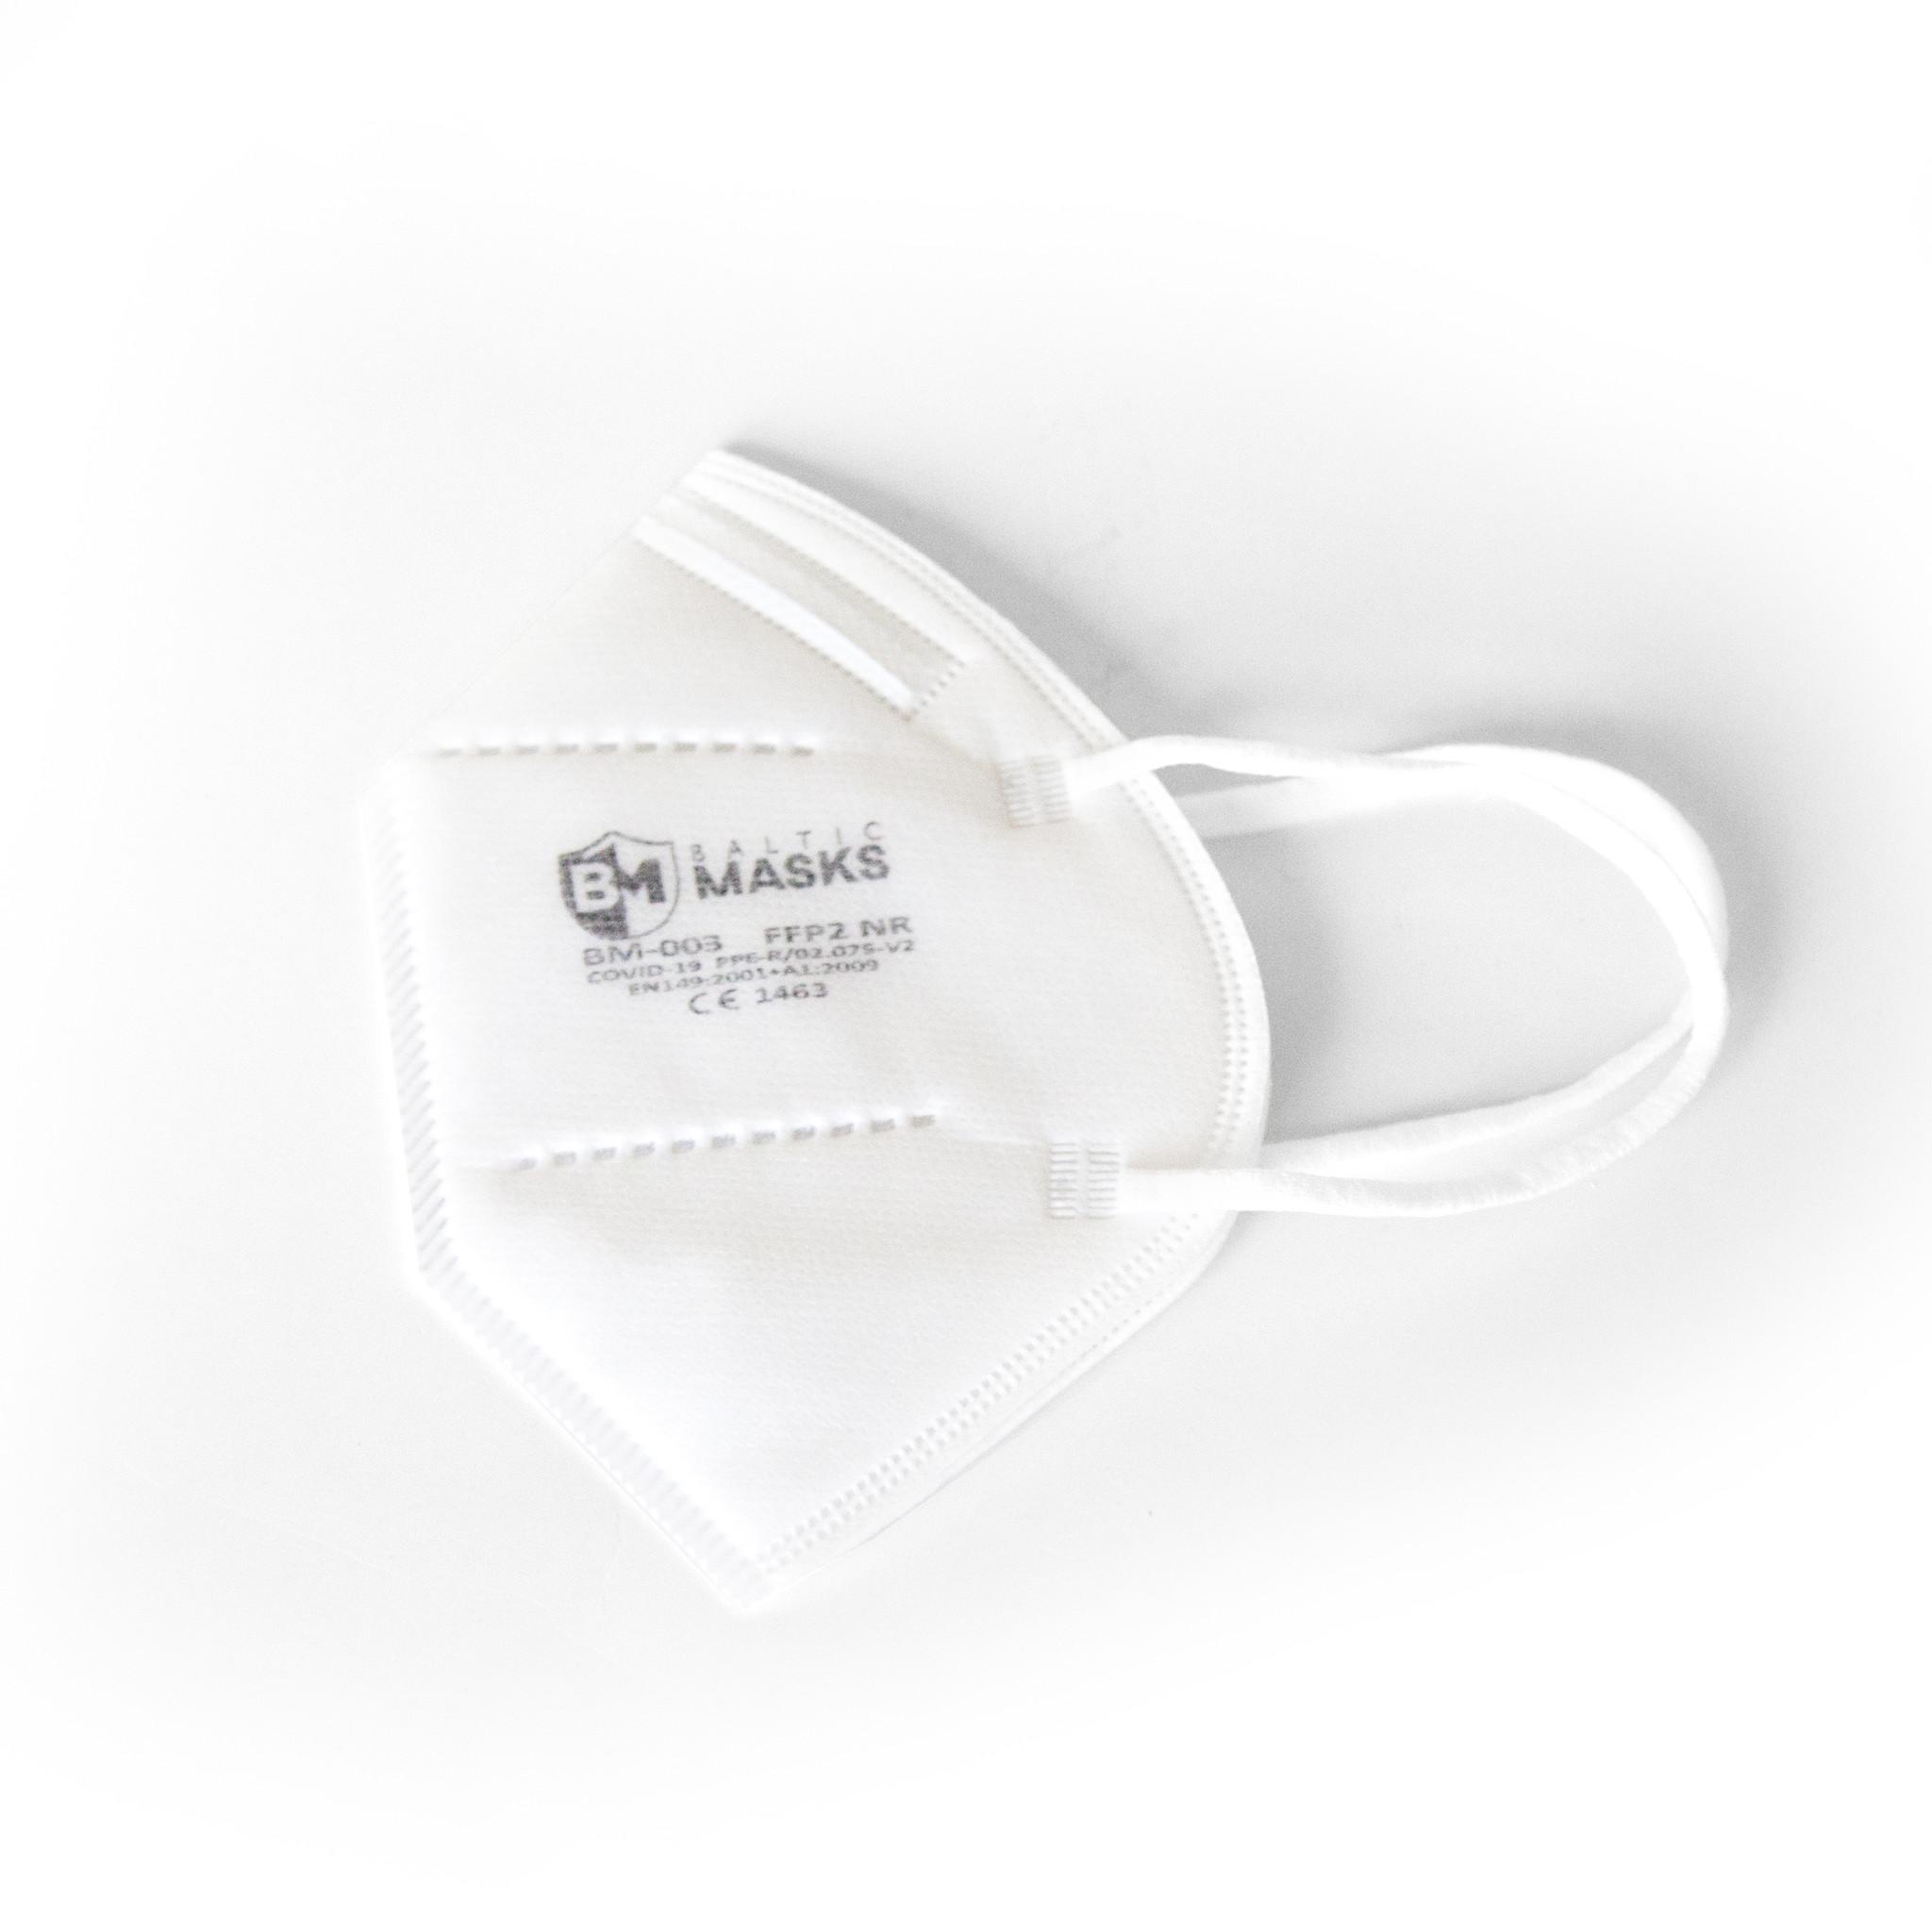 Baltic Masks FFP2 Mondmaskers 10 stuks